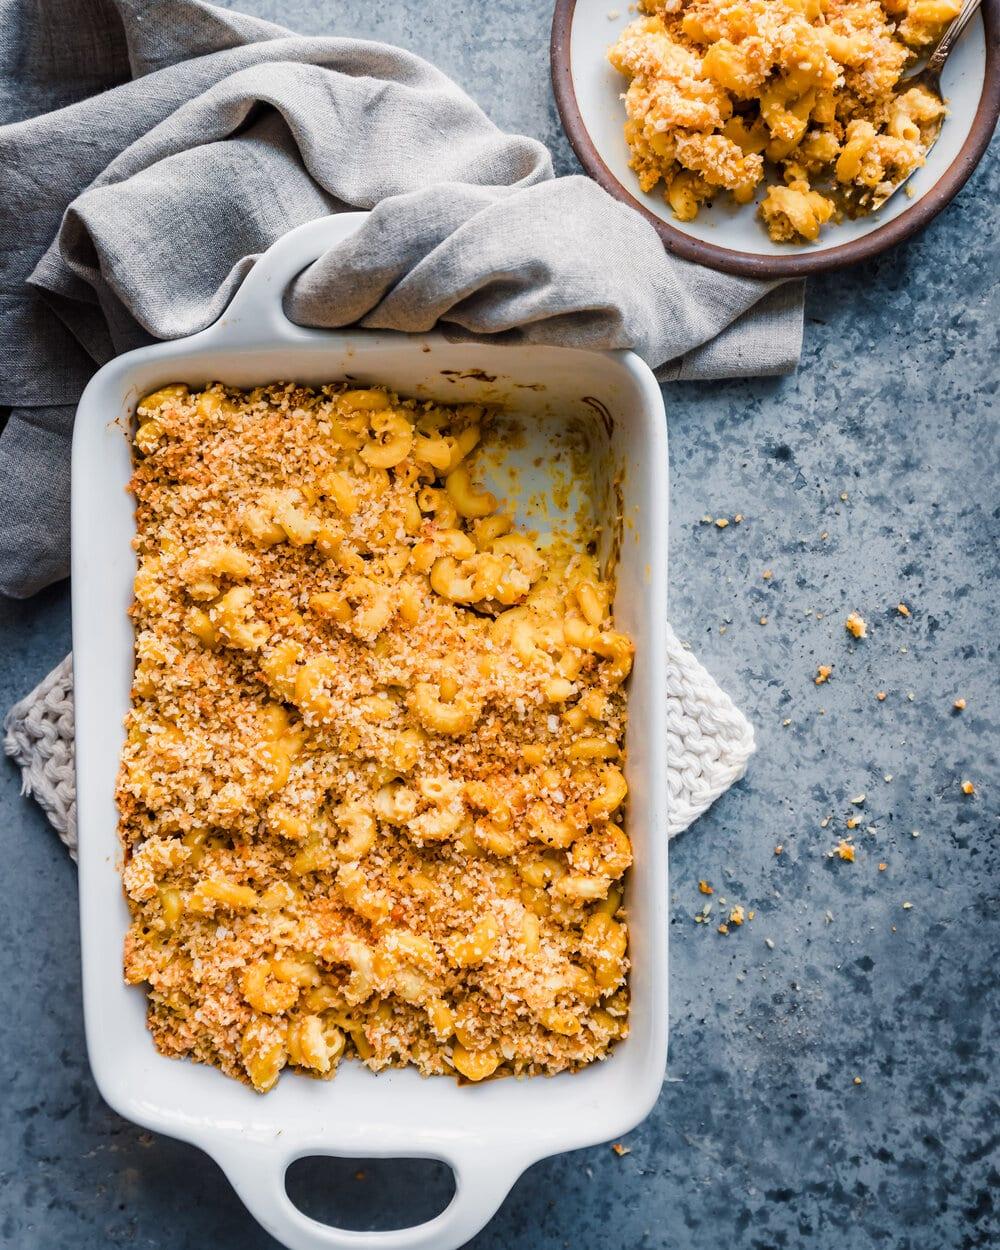 crispy baked vegan mac and cheese in baking pan